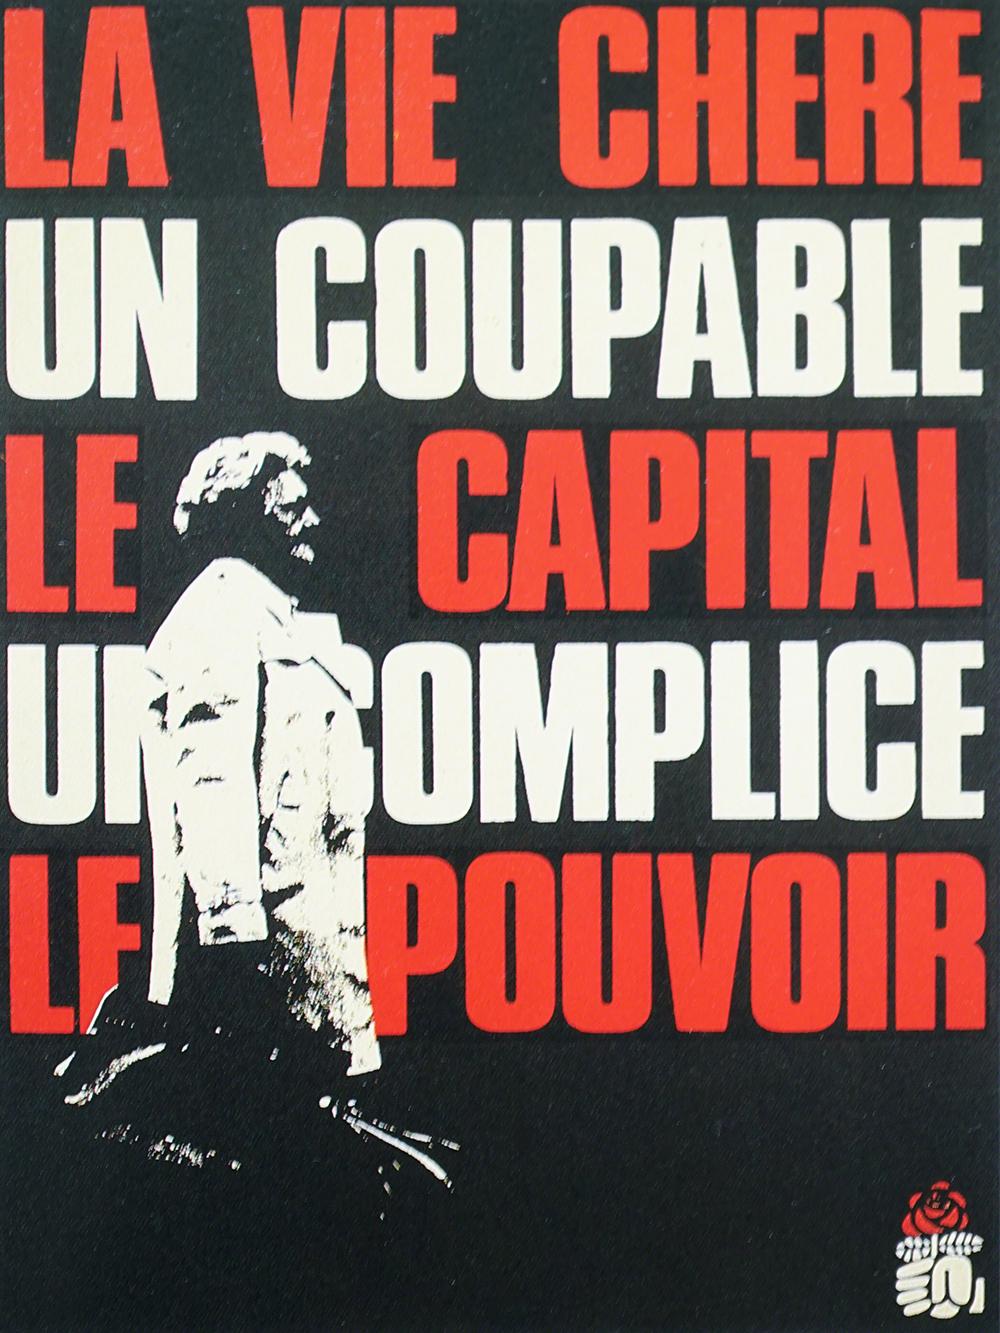 ©1974-la-vie-chere-c-baillargeon-web.jpg